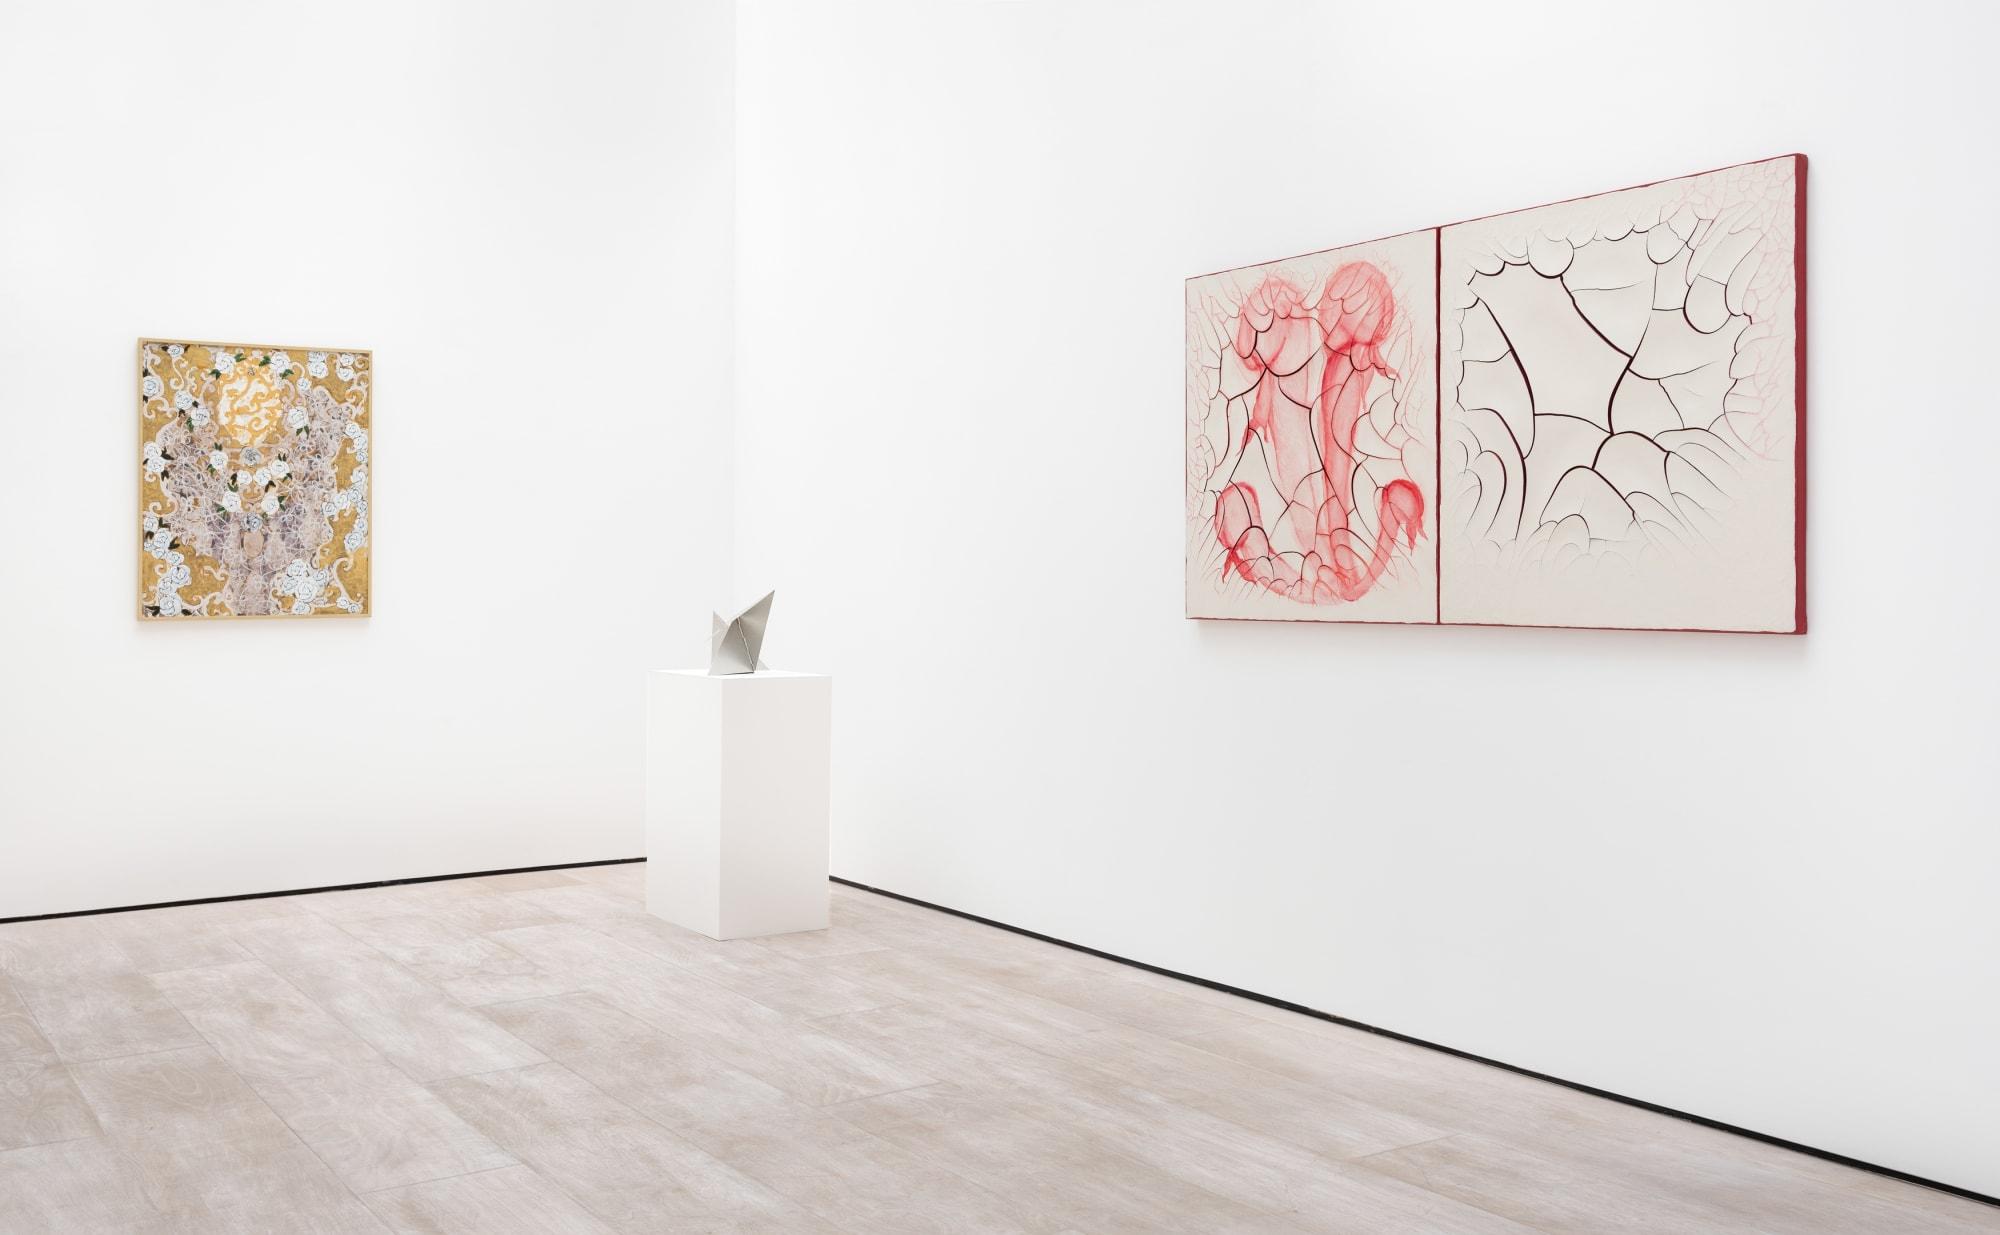 The Women's Century - Female Perspectives in Brazilian Art